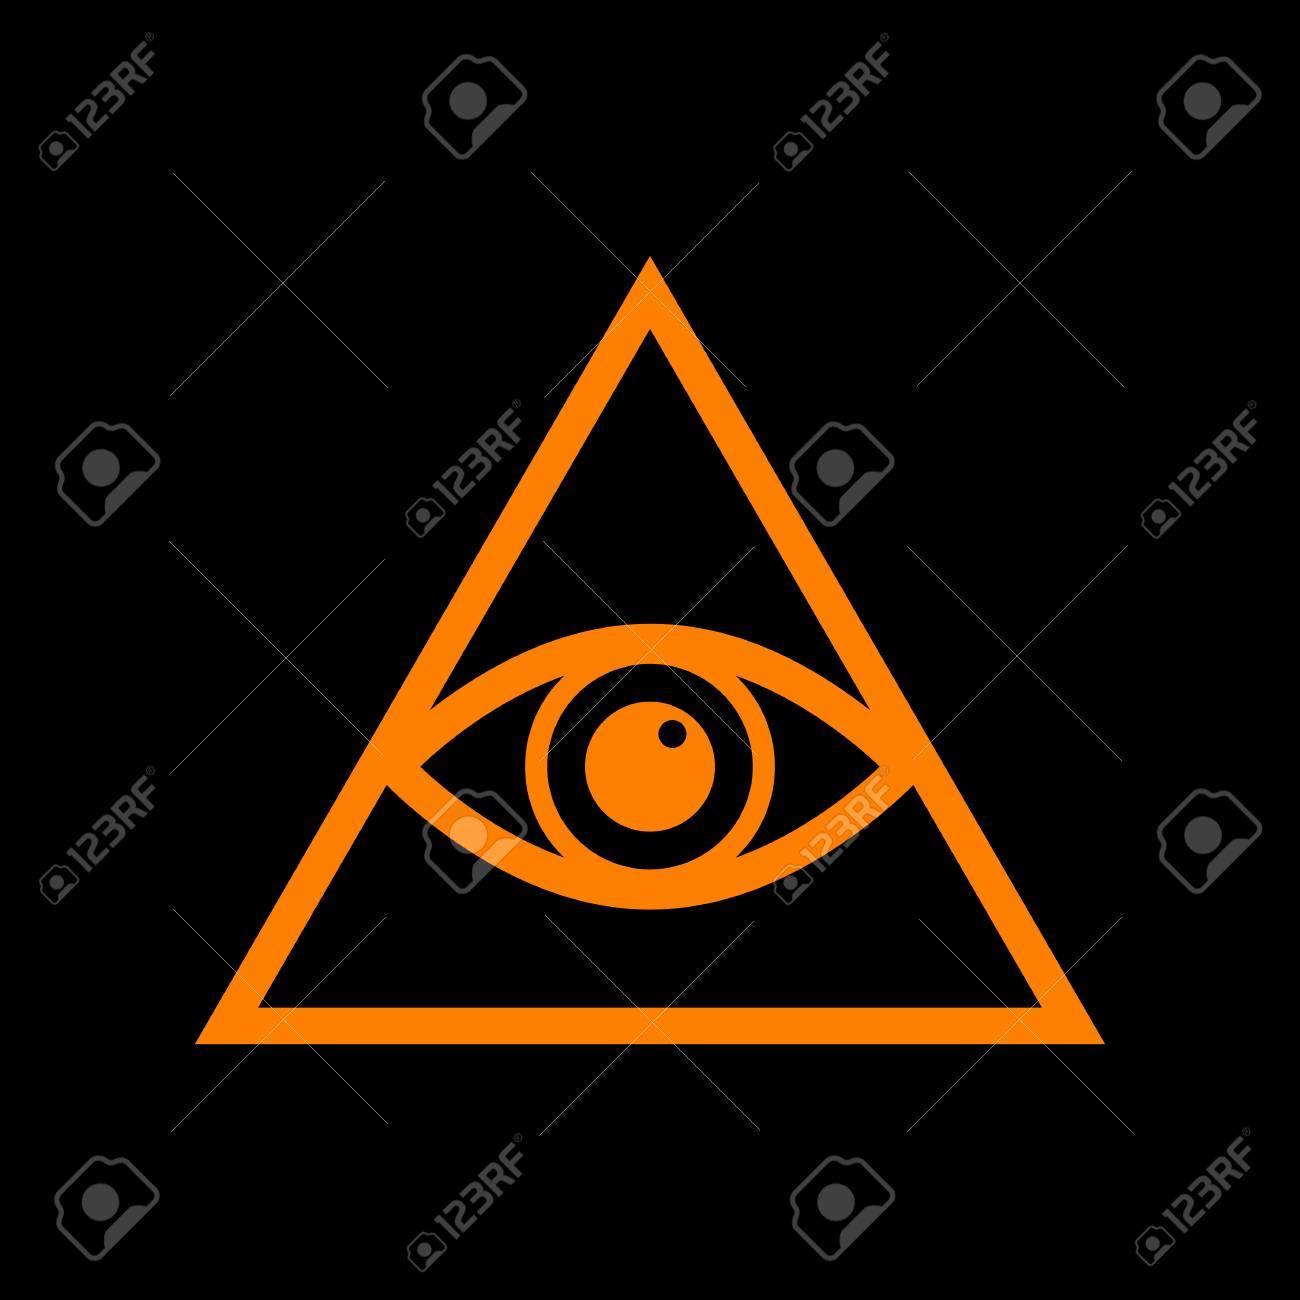 371 new world order stock vector illustration and royalty free new all seeing eye pyramid symbol freemason and spiritual orange icon on black background biocorpaavc Choice Image